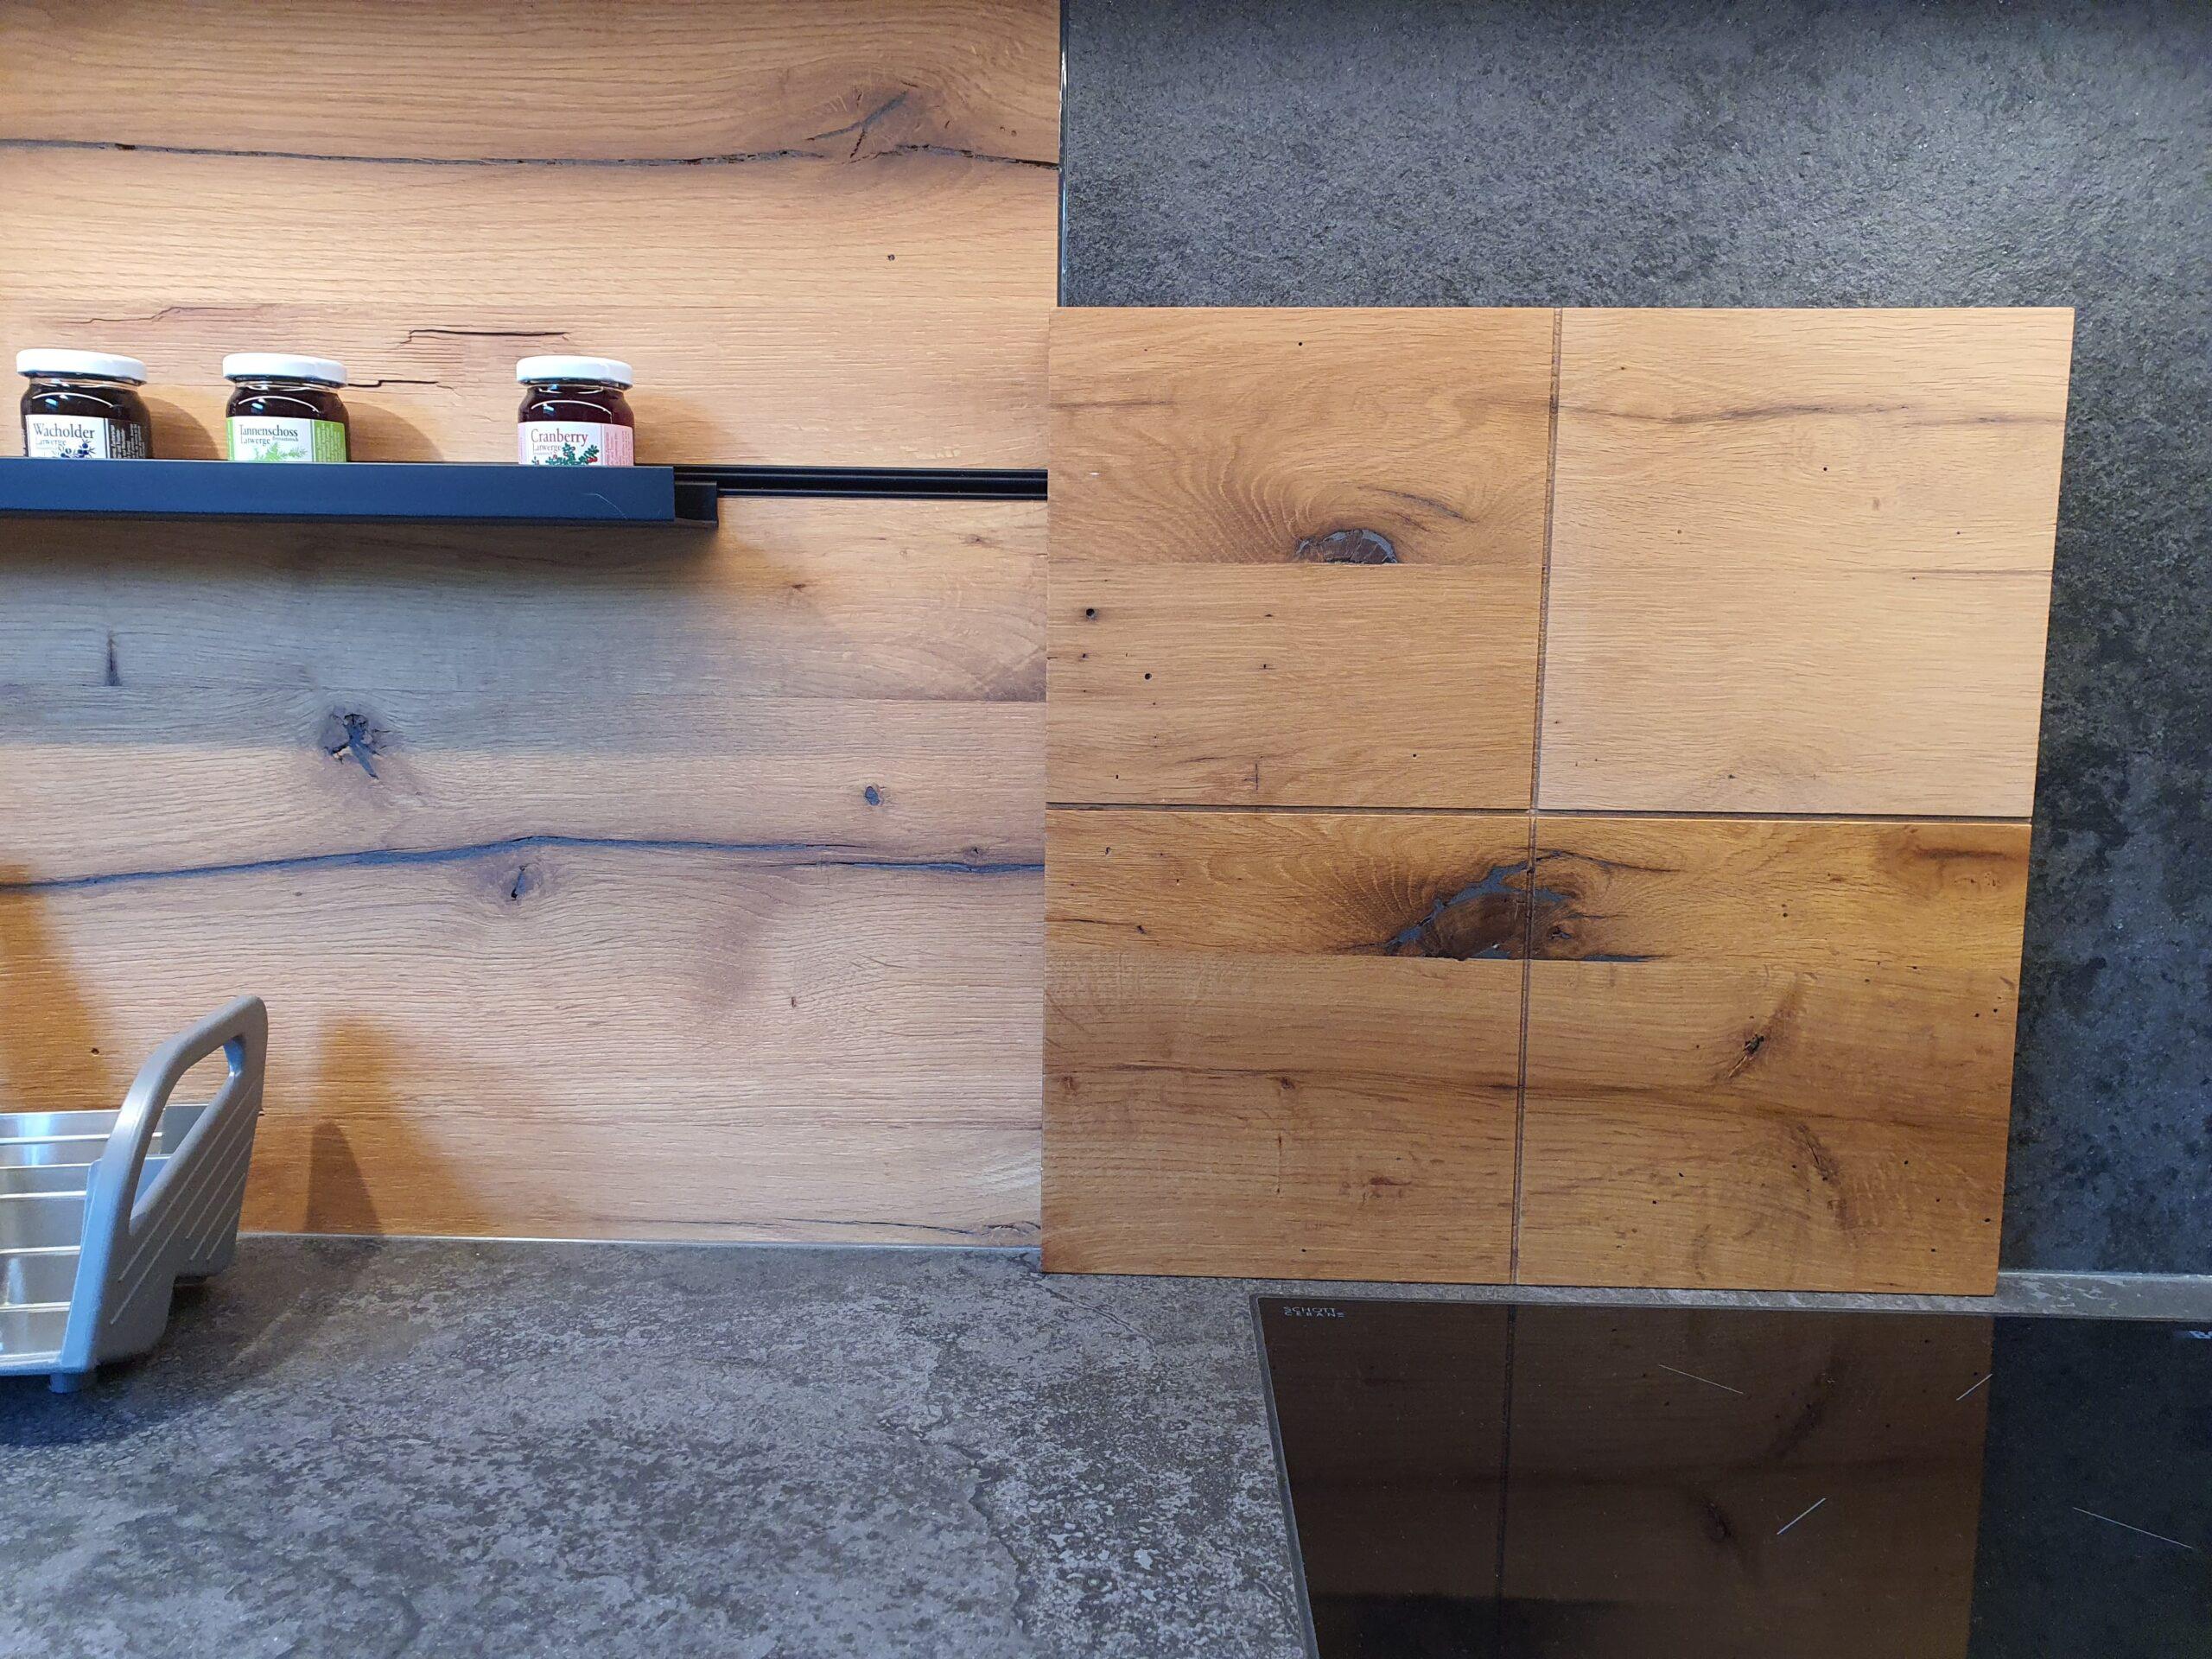 Wooddesign_Holzdesign_Altholzplatten_ Altholz_Eiche Altholz_Altholztäfer_alte Beschläge_Altholzkleidungen(5)